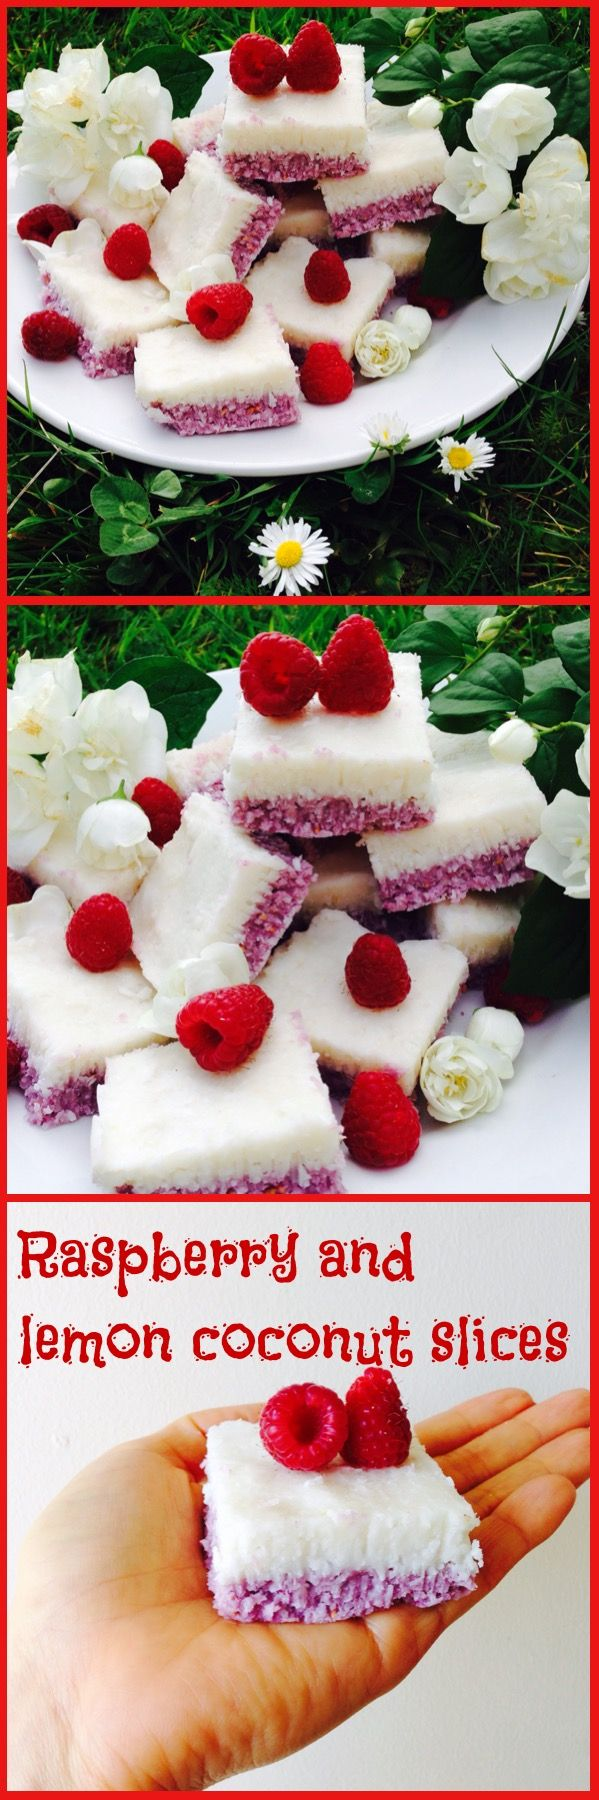 Clean eating dessert raspberry and lemon coconut slices. Rich, indulgent, gluten free, dairy free, refined sugar free, vegan, vegetarians and paleo friendly!